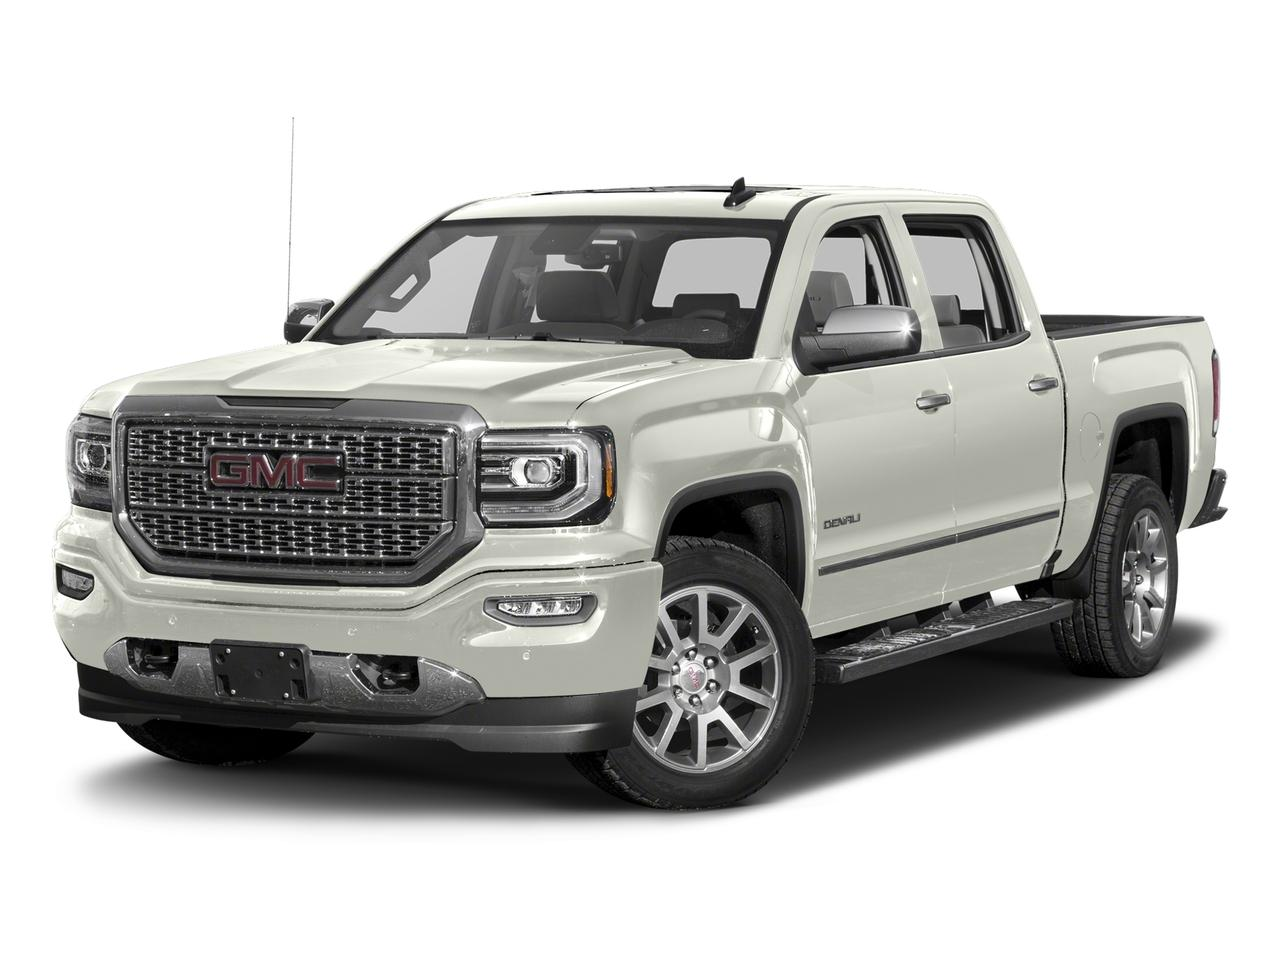 Used 2018 Gmc Vehicles For Sale In Big Rapids Mi Betten Baker Chevrolet Buick Gmc